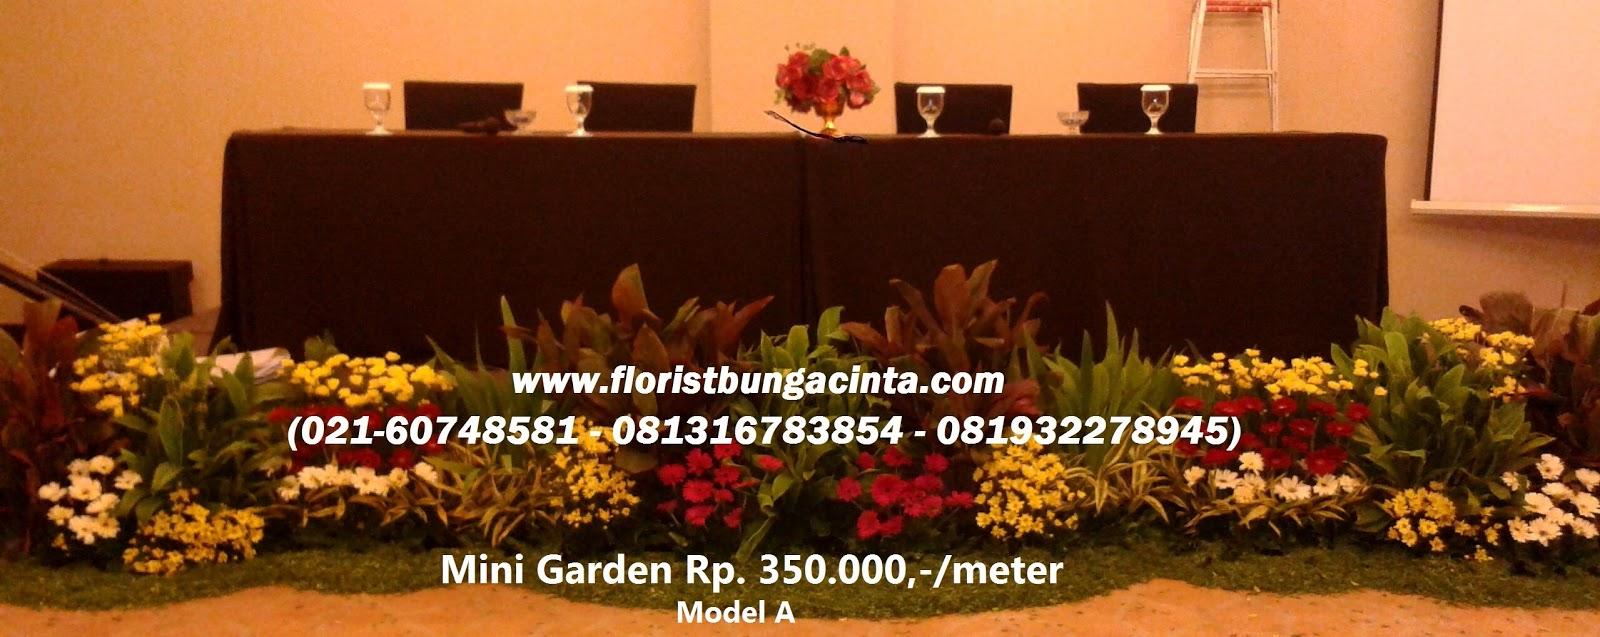 Rusty Florist Jakarta Online Flower Shop Taman Dekorasi Panggung